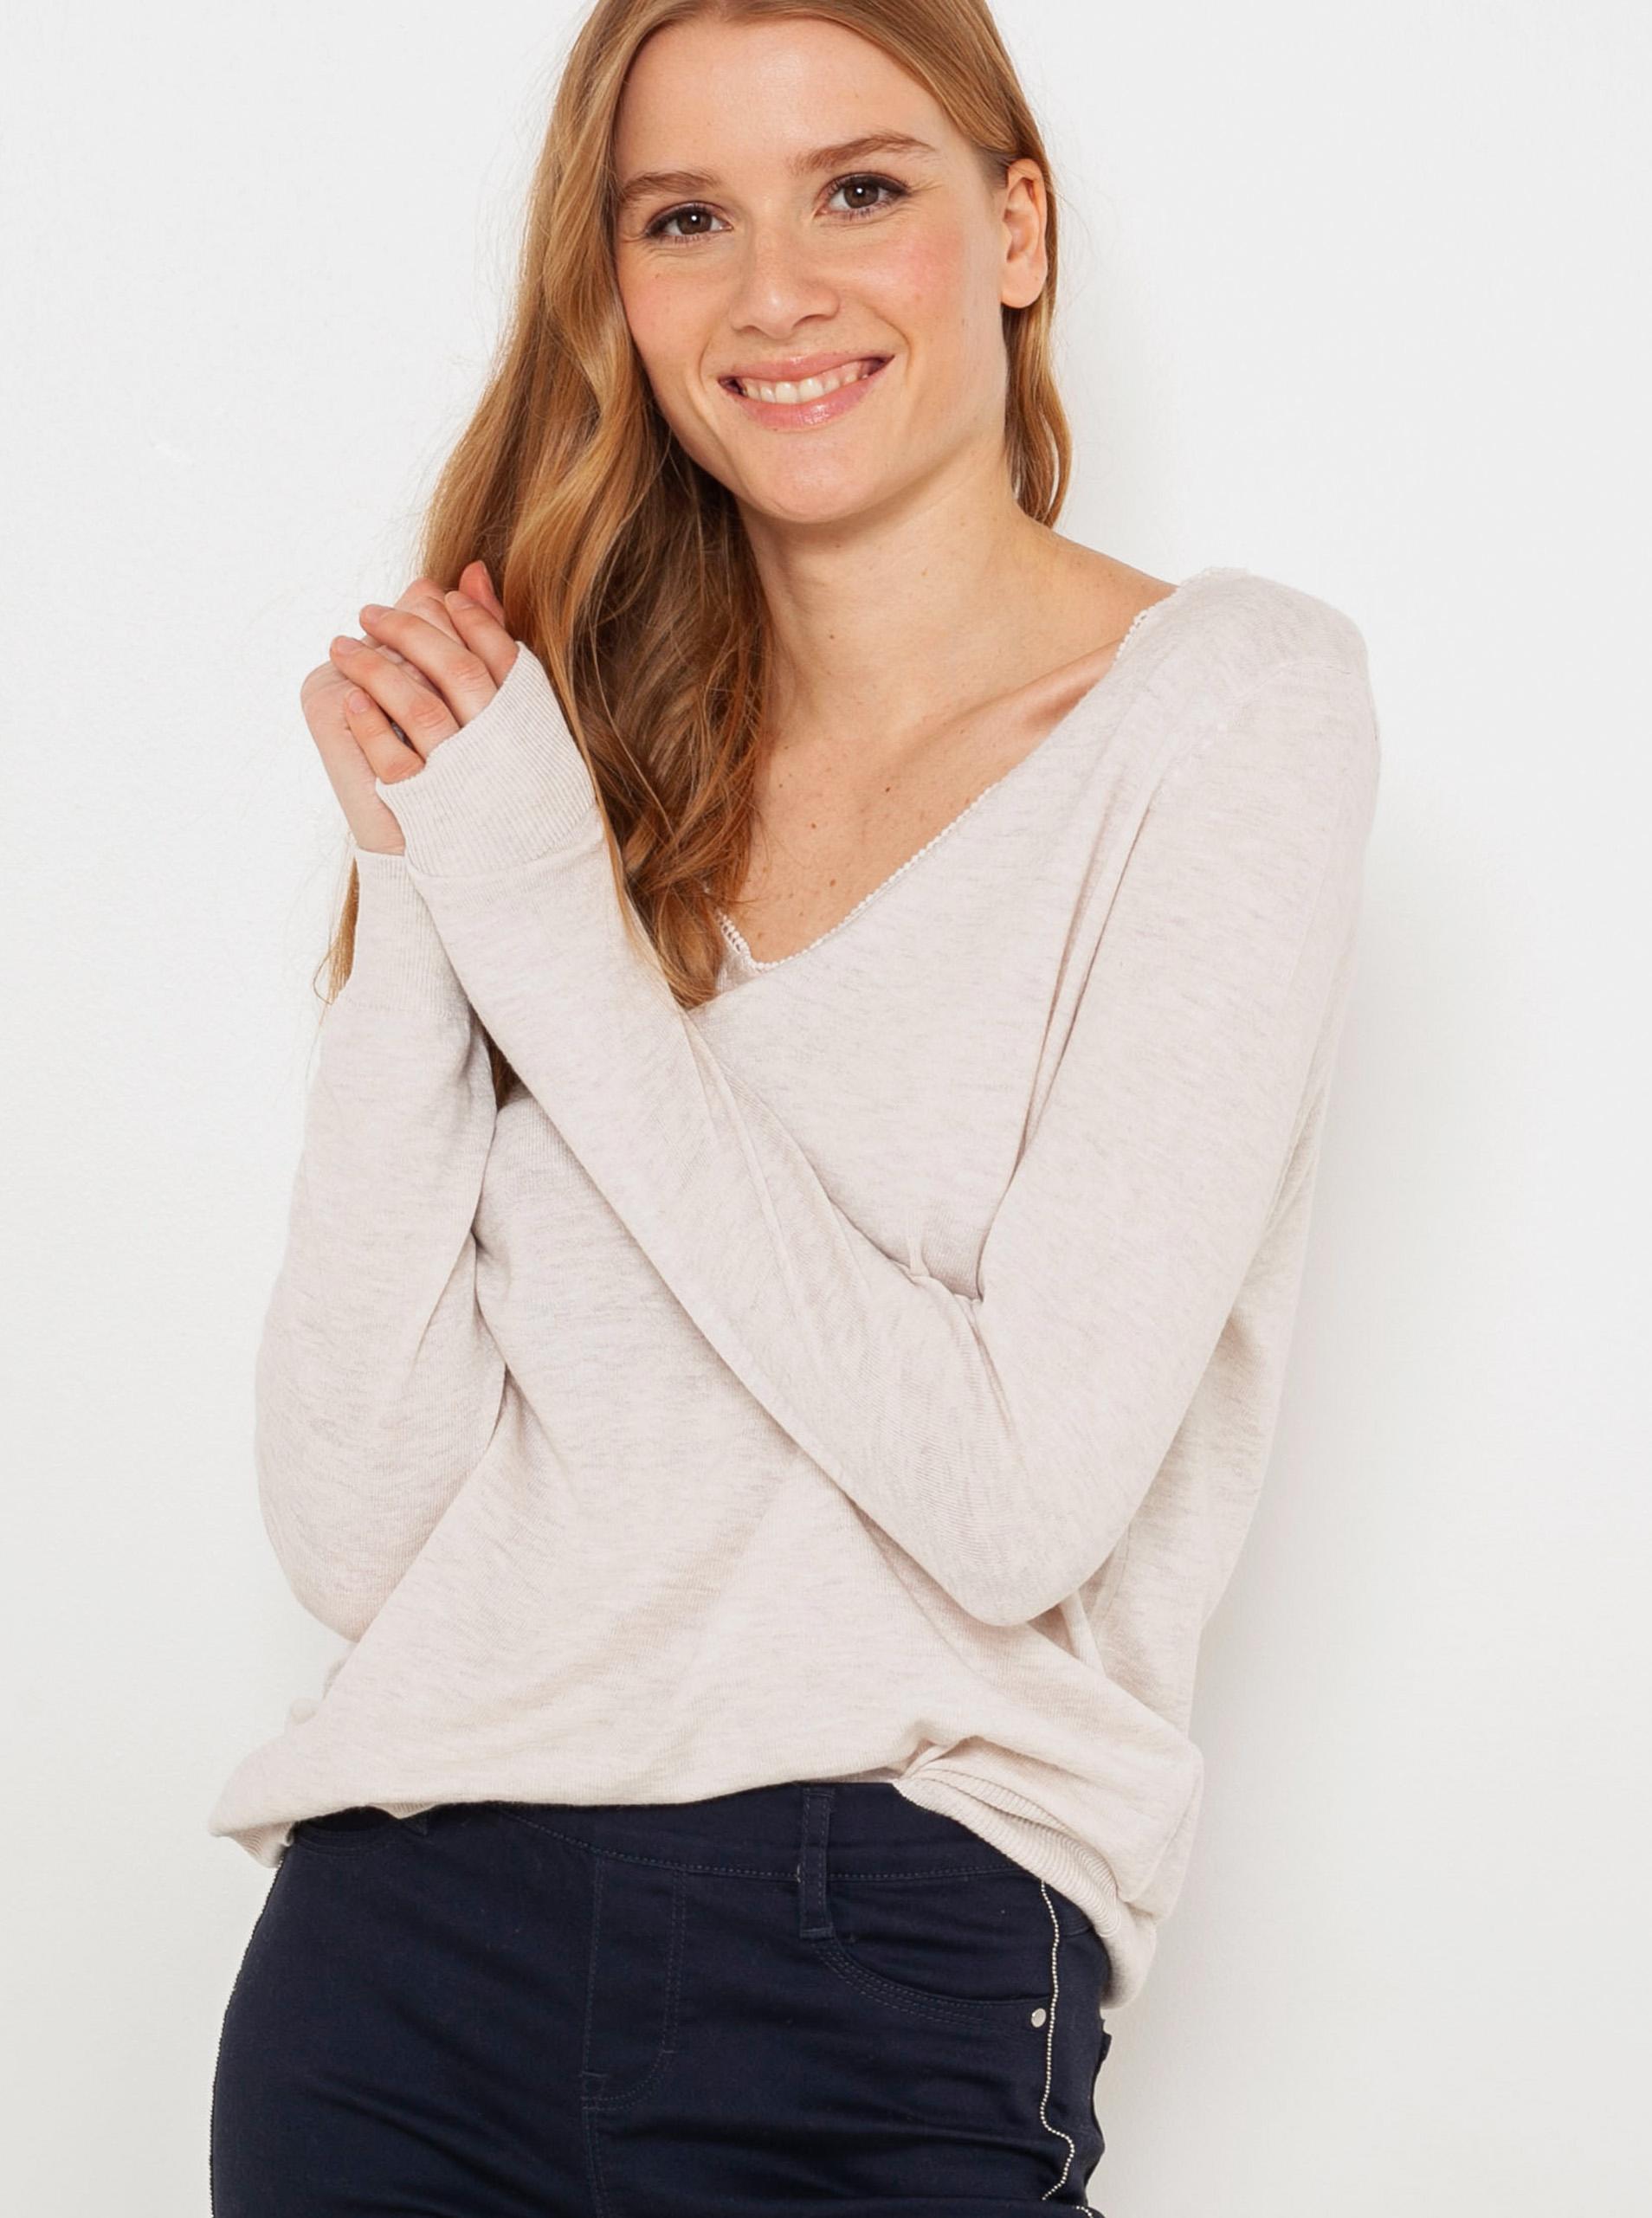 CAMAIEU écru/kremowy damska koszulka